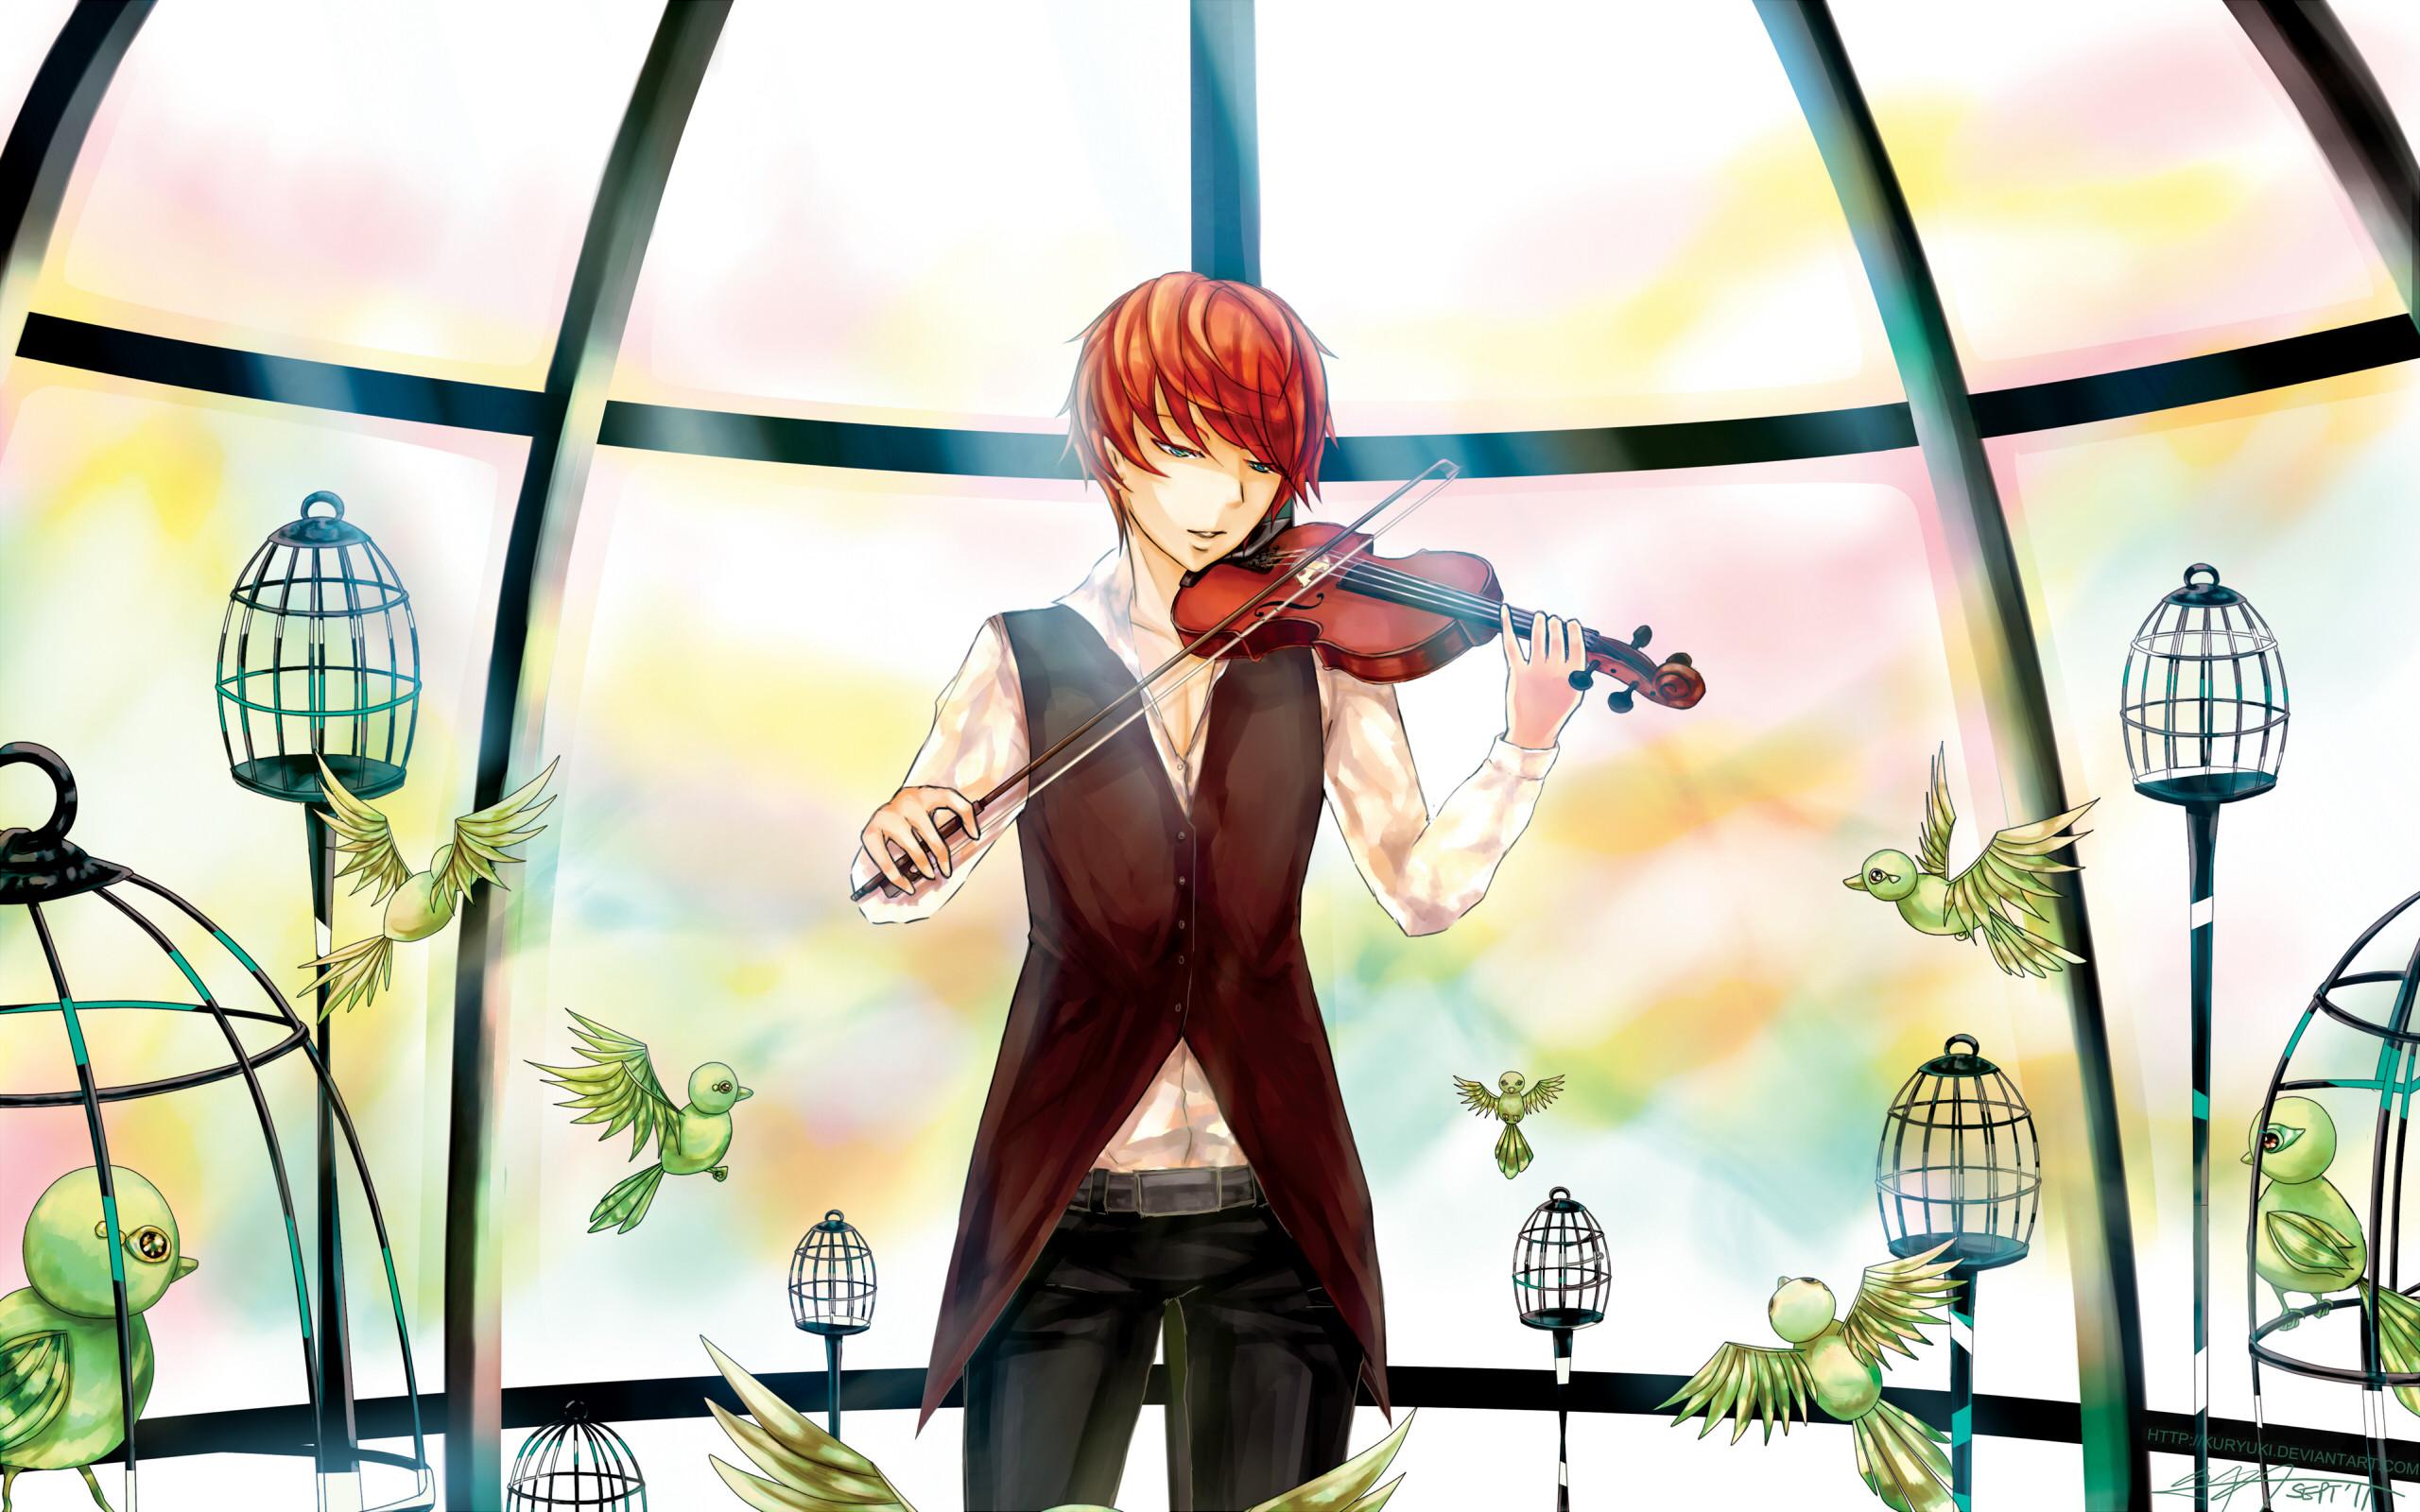 Original music boy violin art wallpaper   .